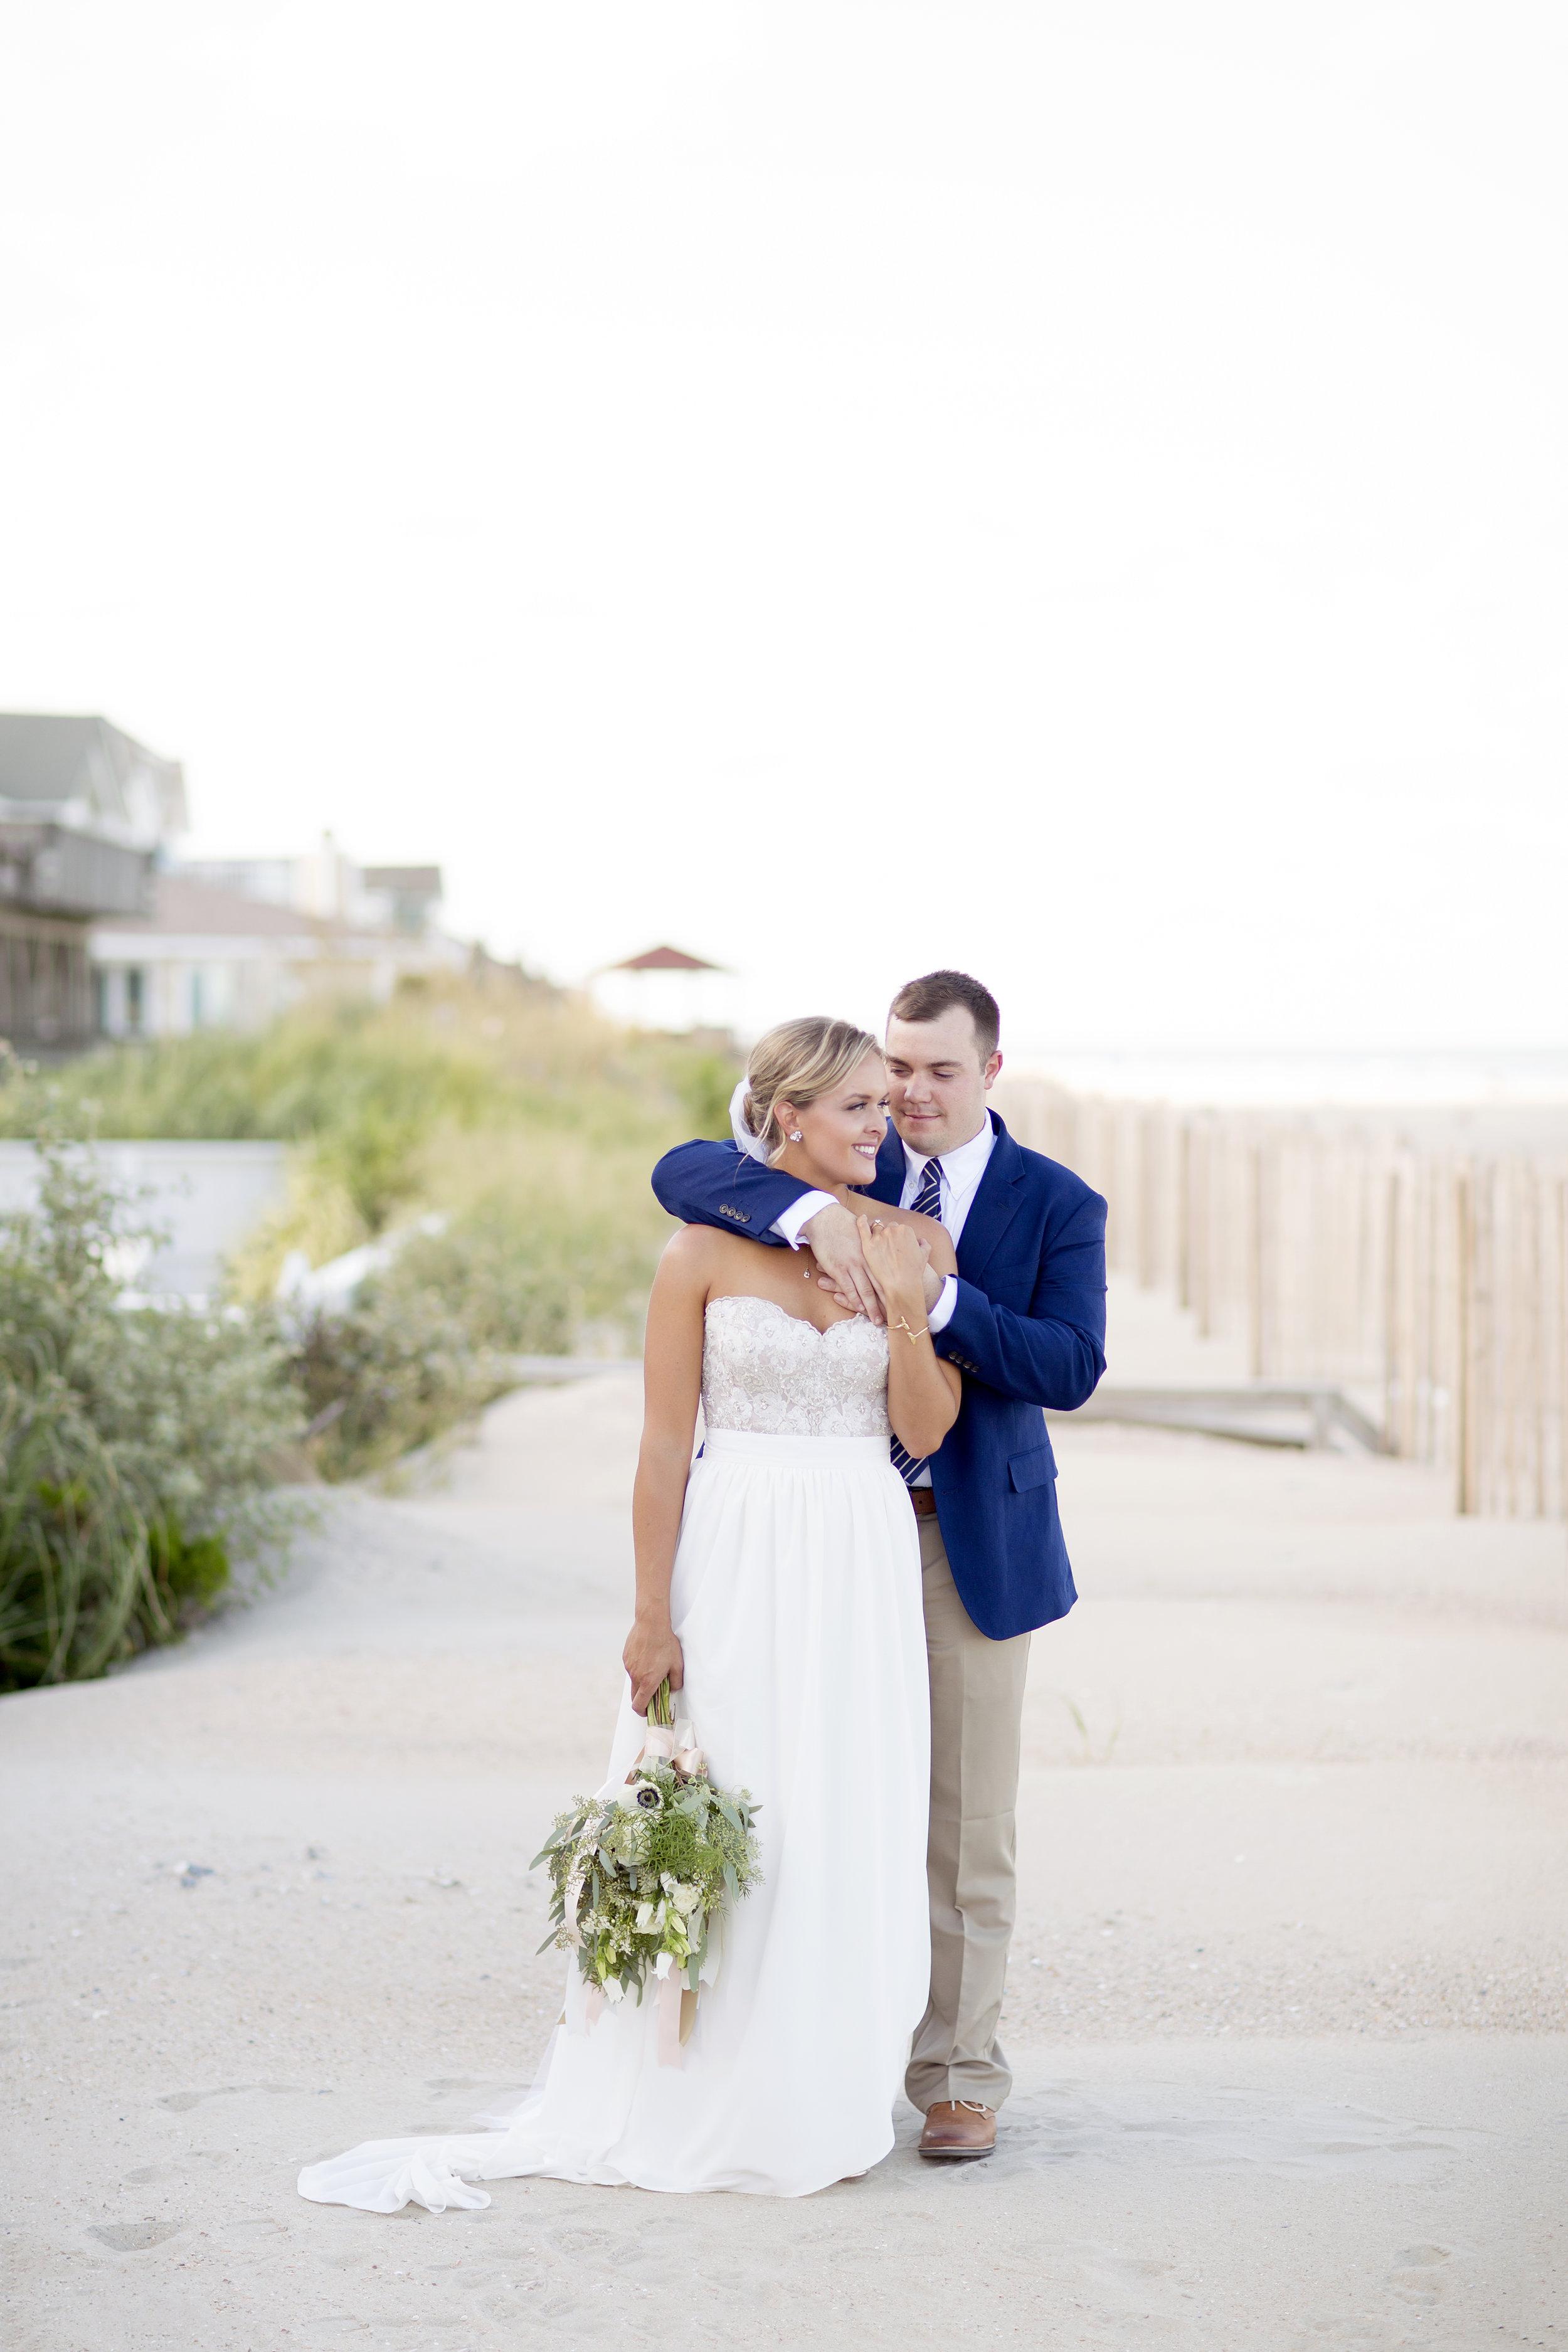 20170827_carroll_wedding_1040.jpg